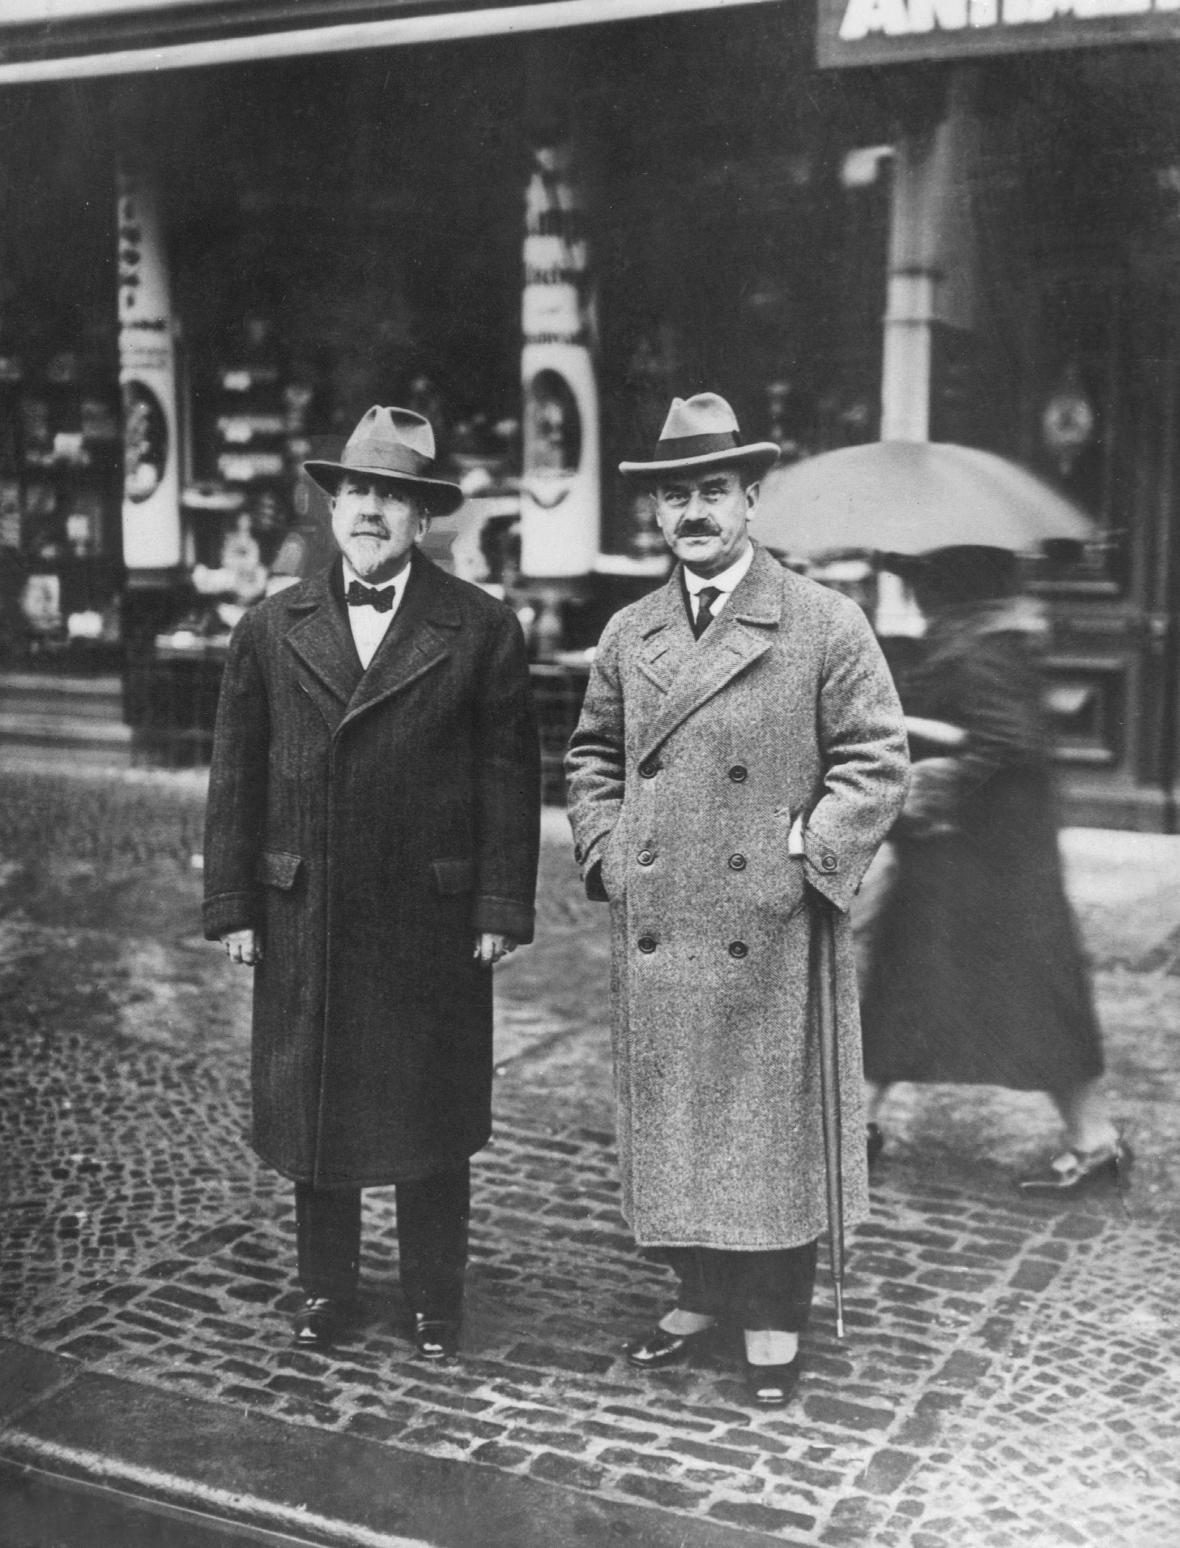 Bratři Heinrich a Thomas Mann v roce 19828